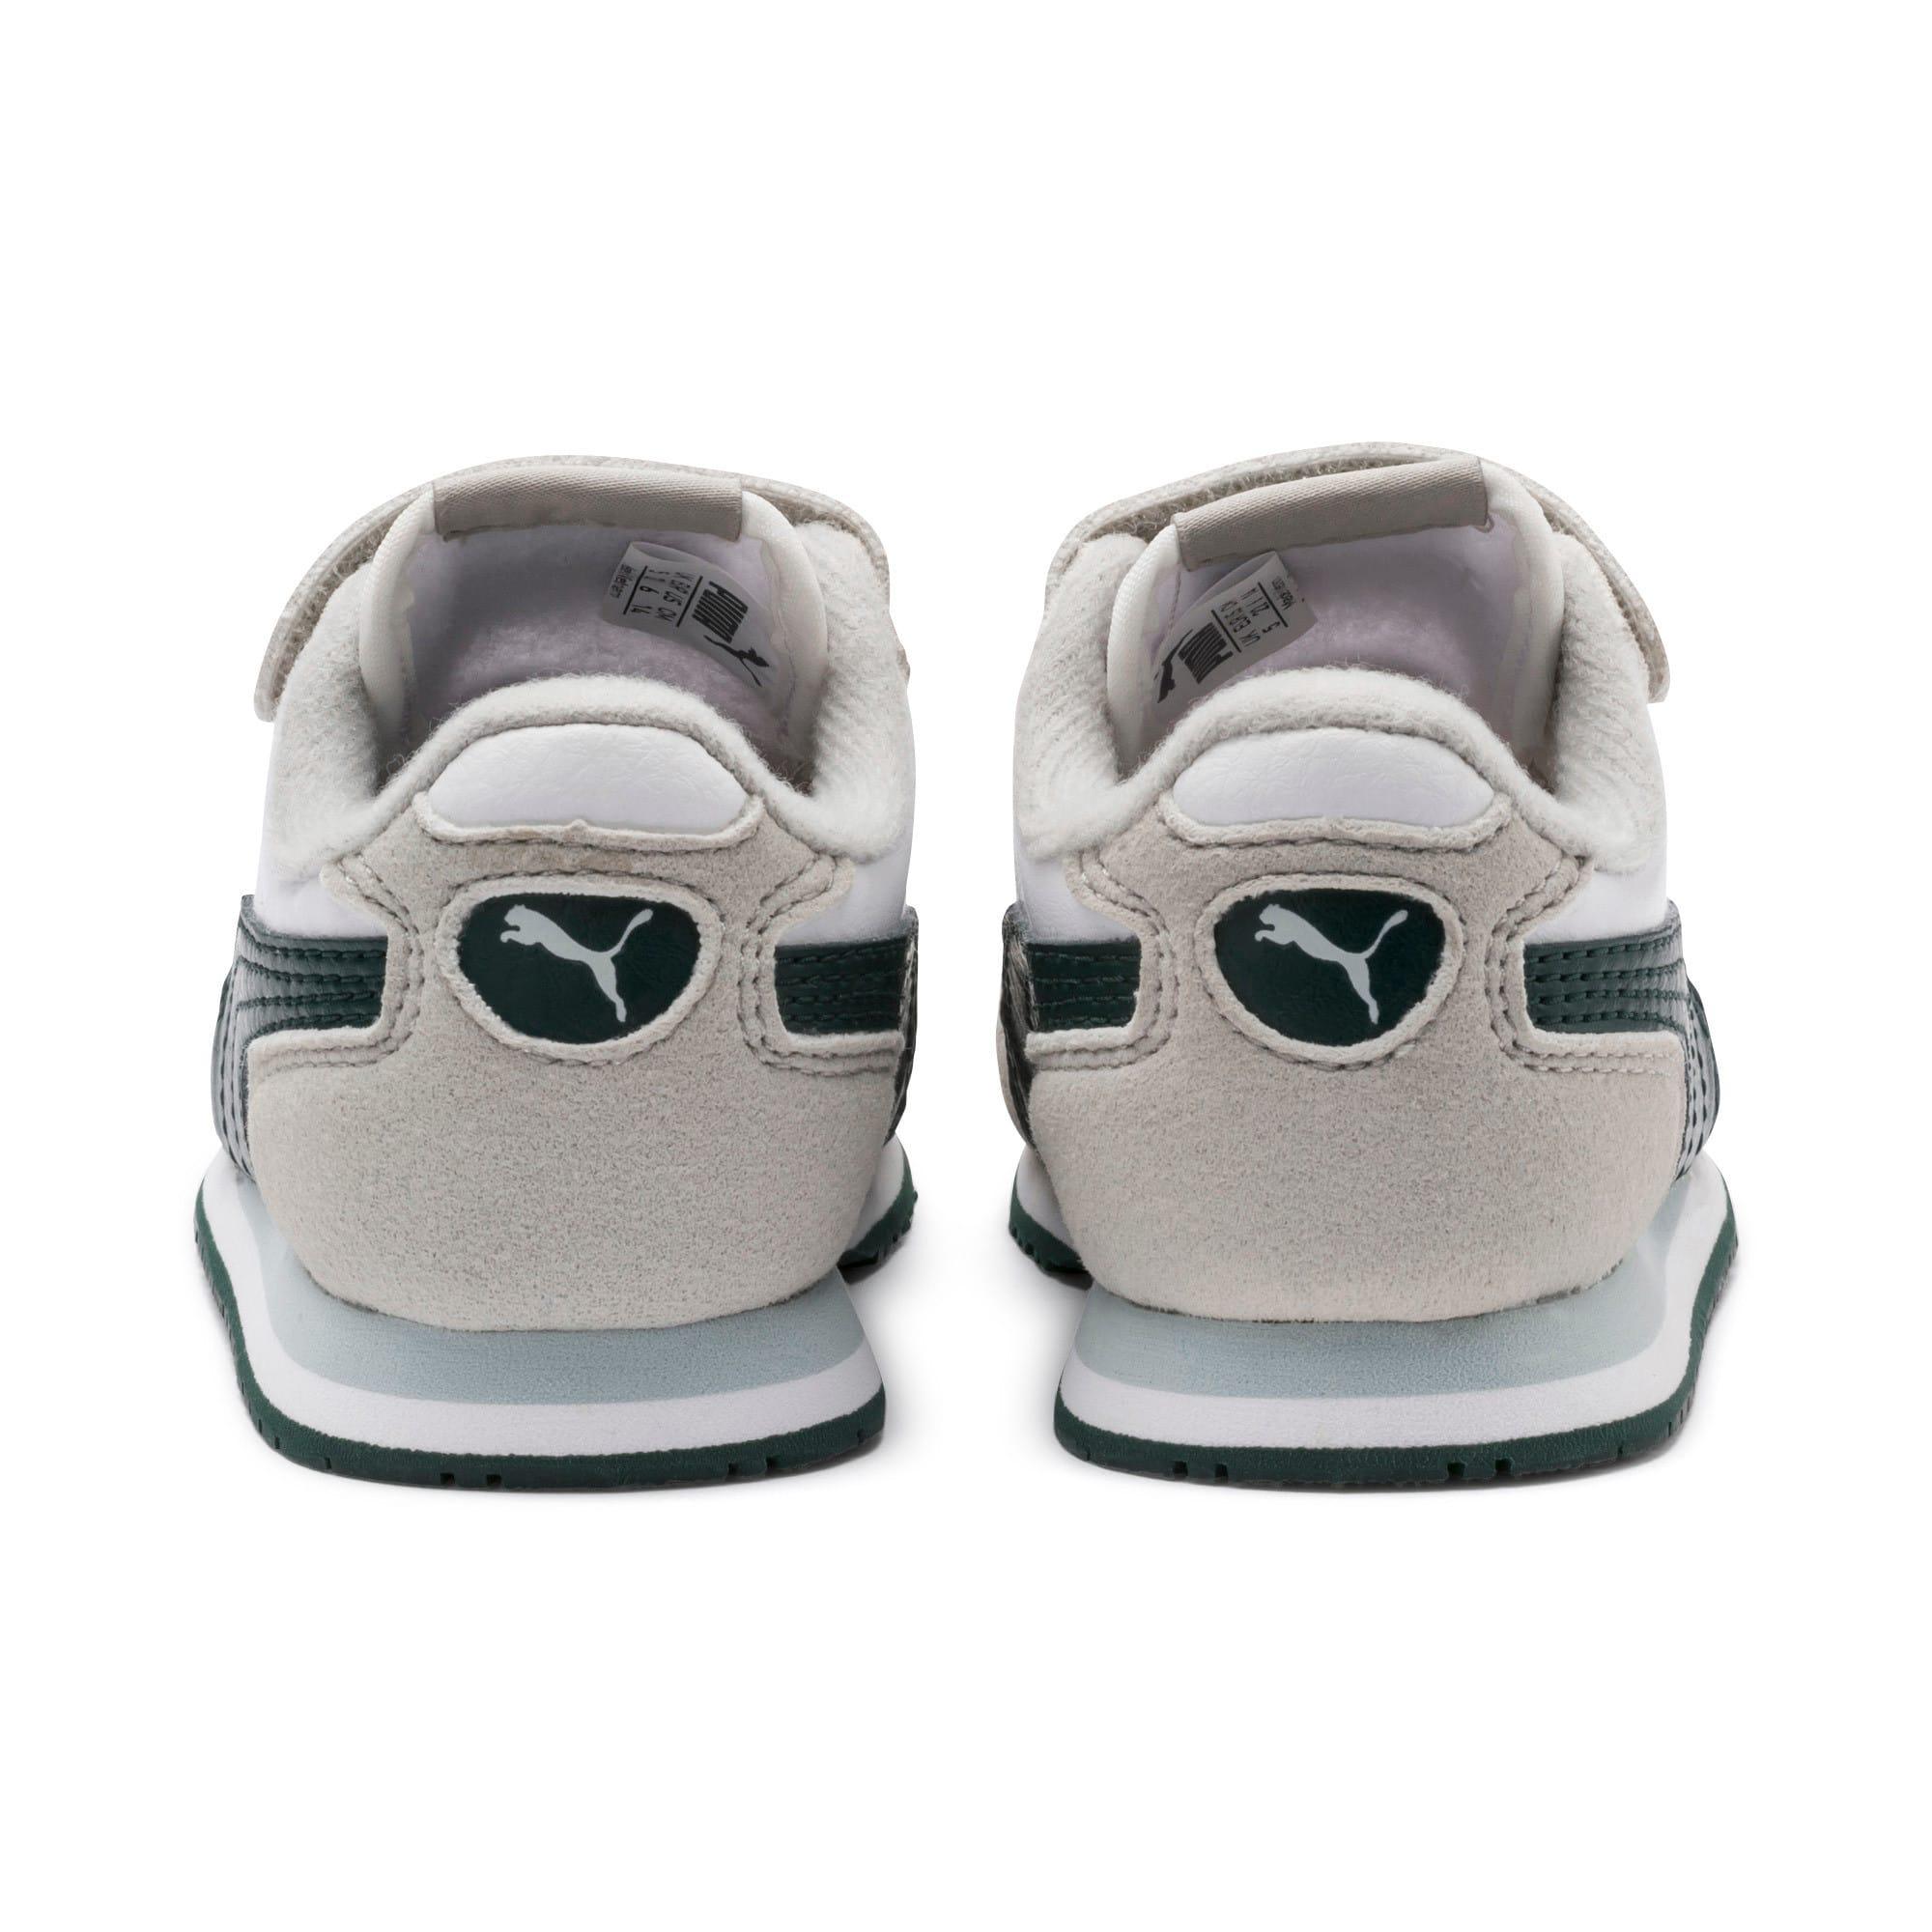 Thumbnail 3 of Cabana Racer SL Toddler Shoes, Puma White-Gray Violet, medium